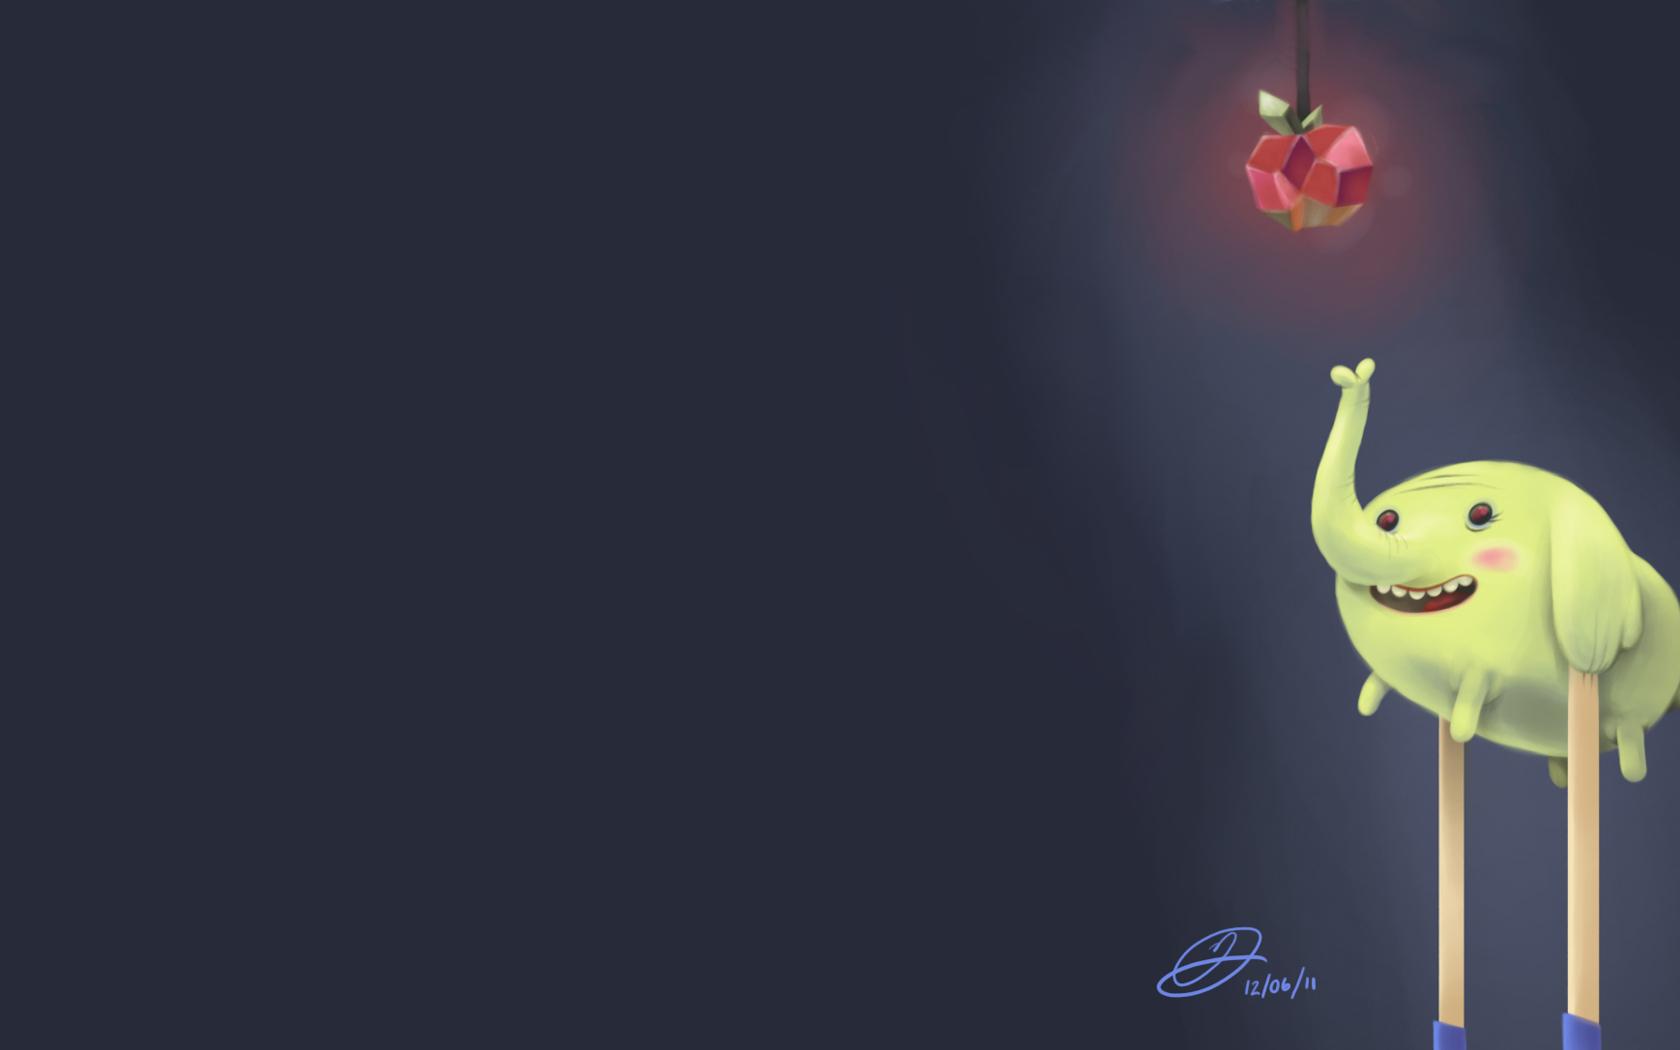 Adventure Time Wallpaper 1680x1050 Adventure Time 1680x1050